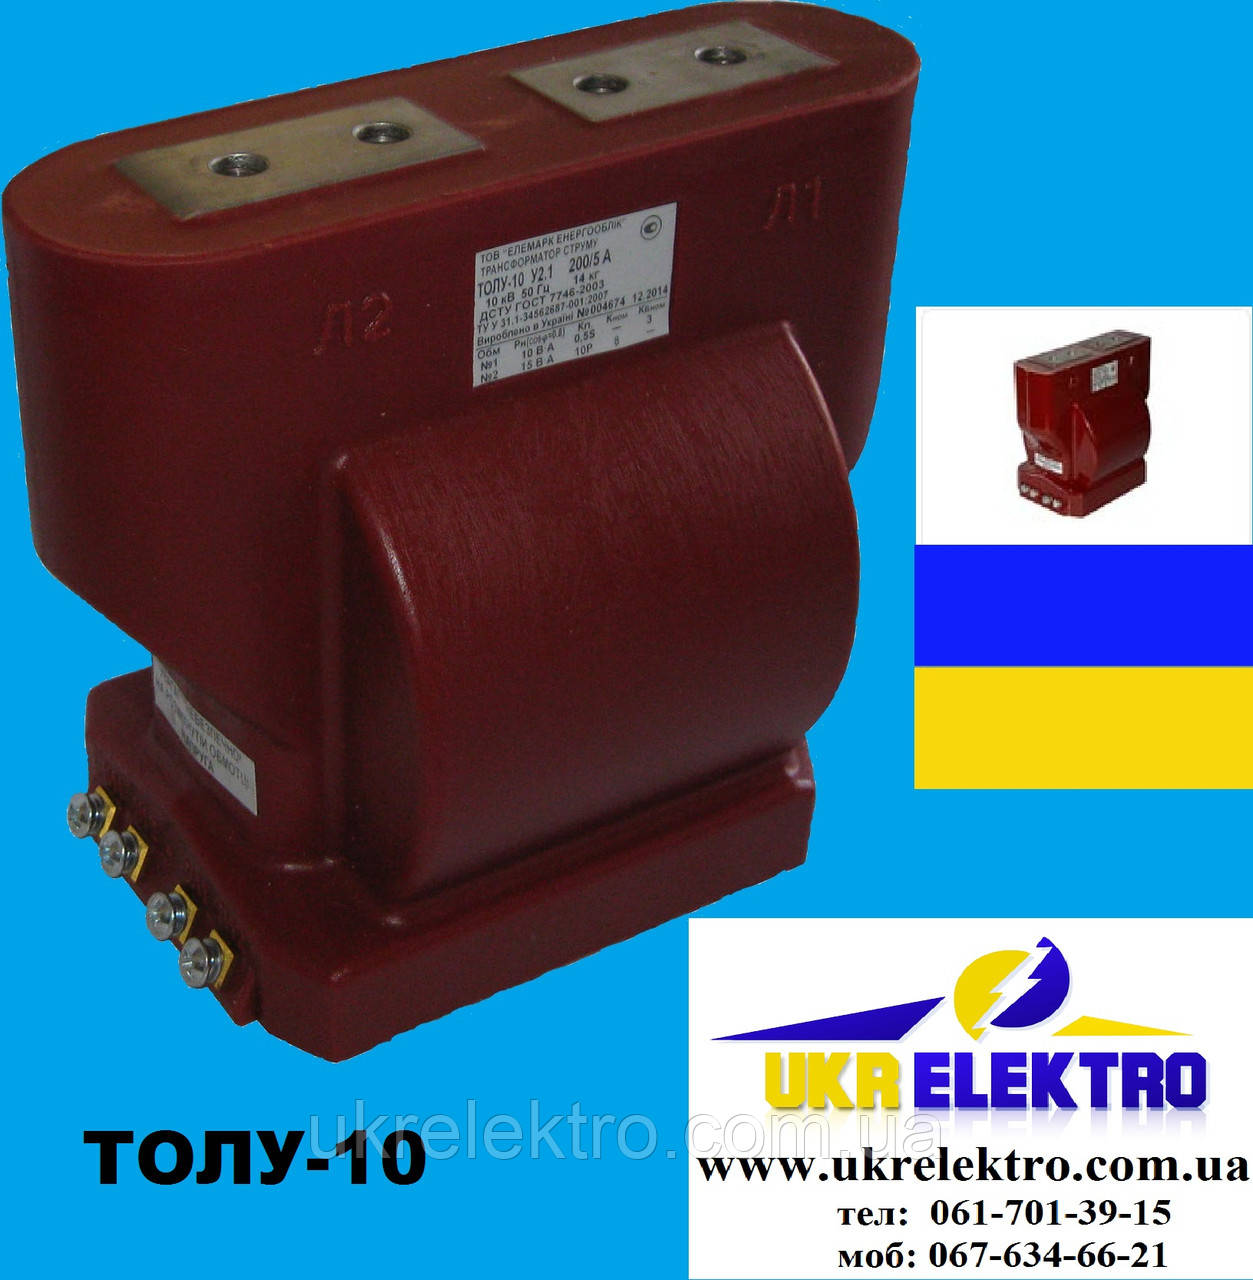 Трансформатор тока ТОЛУ-10 200/5 0,5s